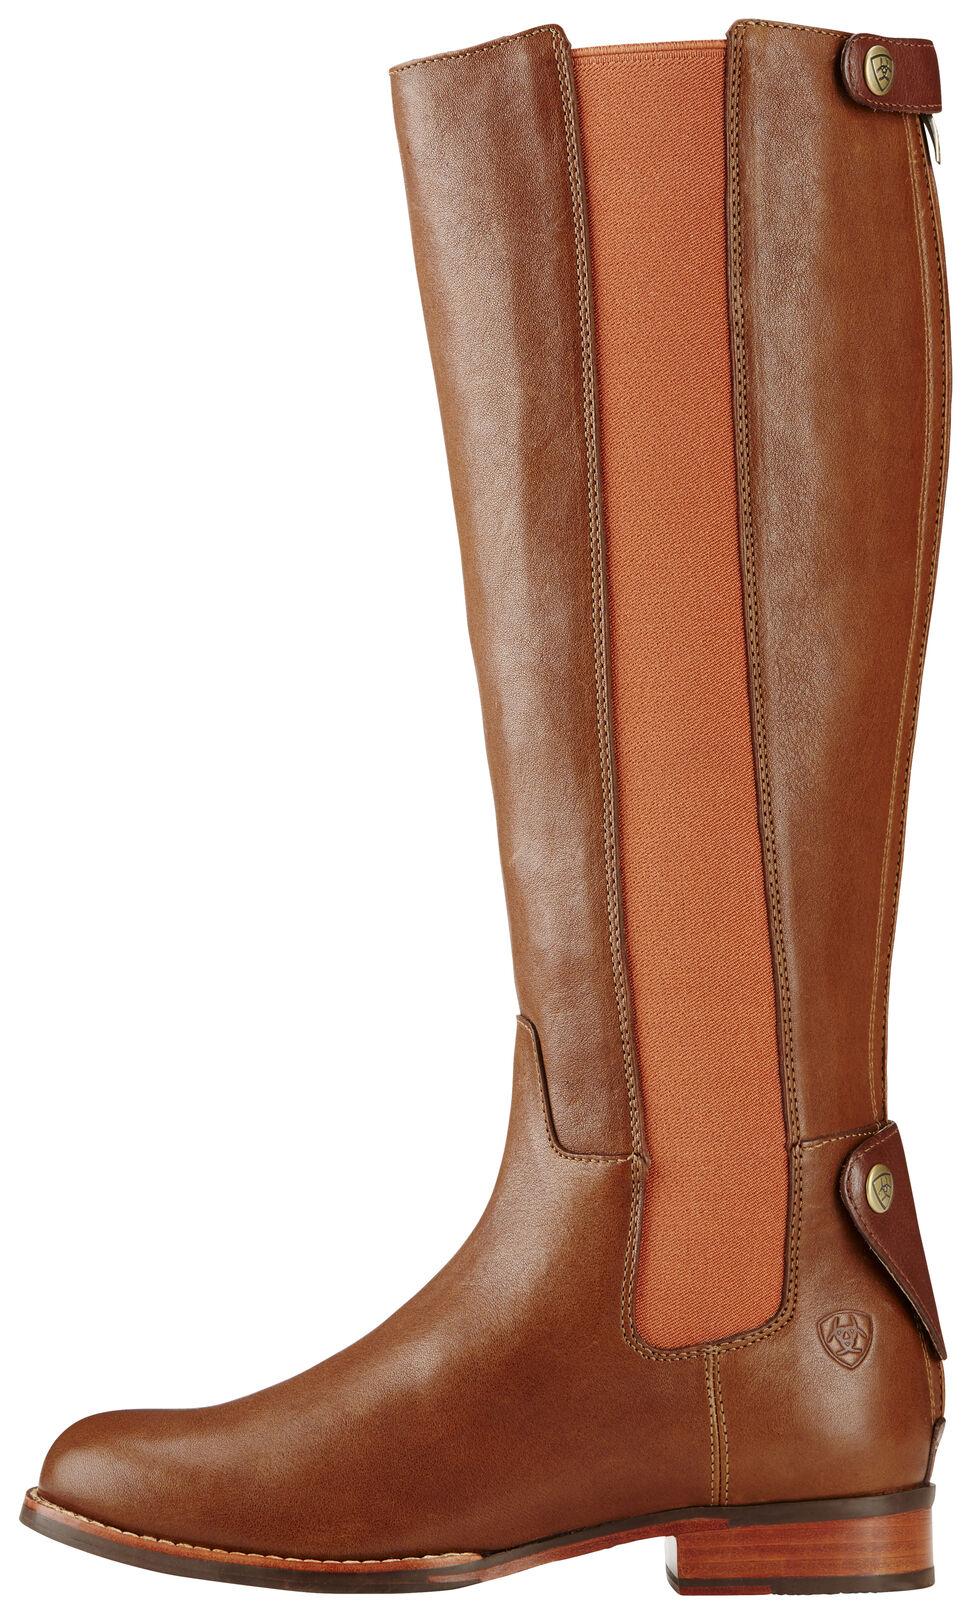 Ariat Women's Pumpkin Spice Waverly Tall Boots - Round Toe , Tan, hi-res